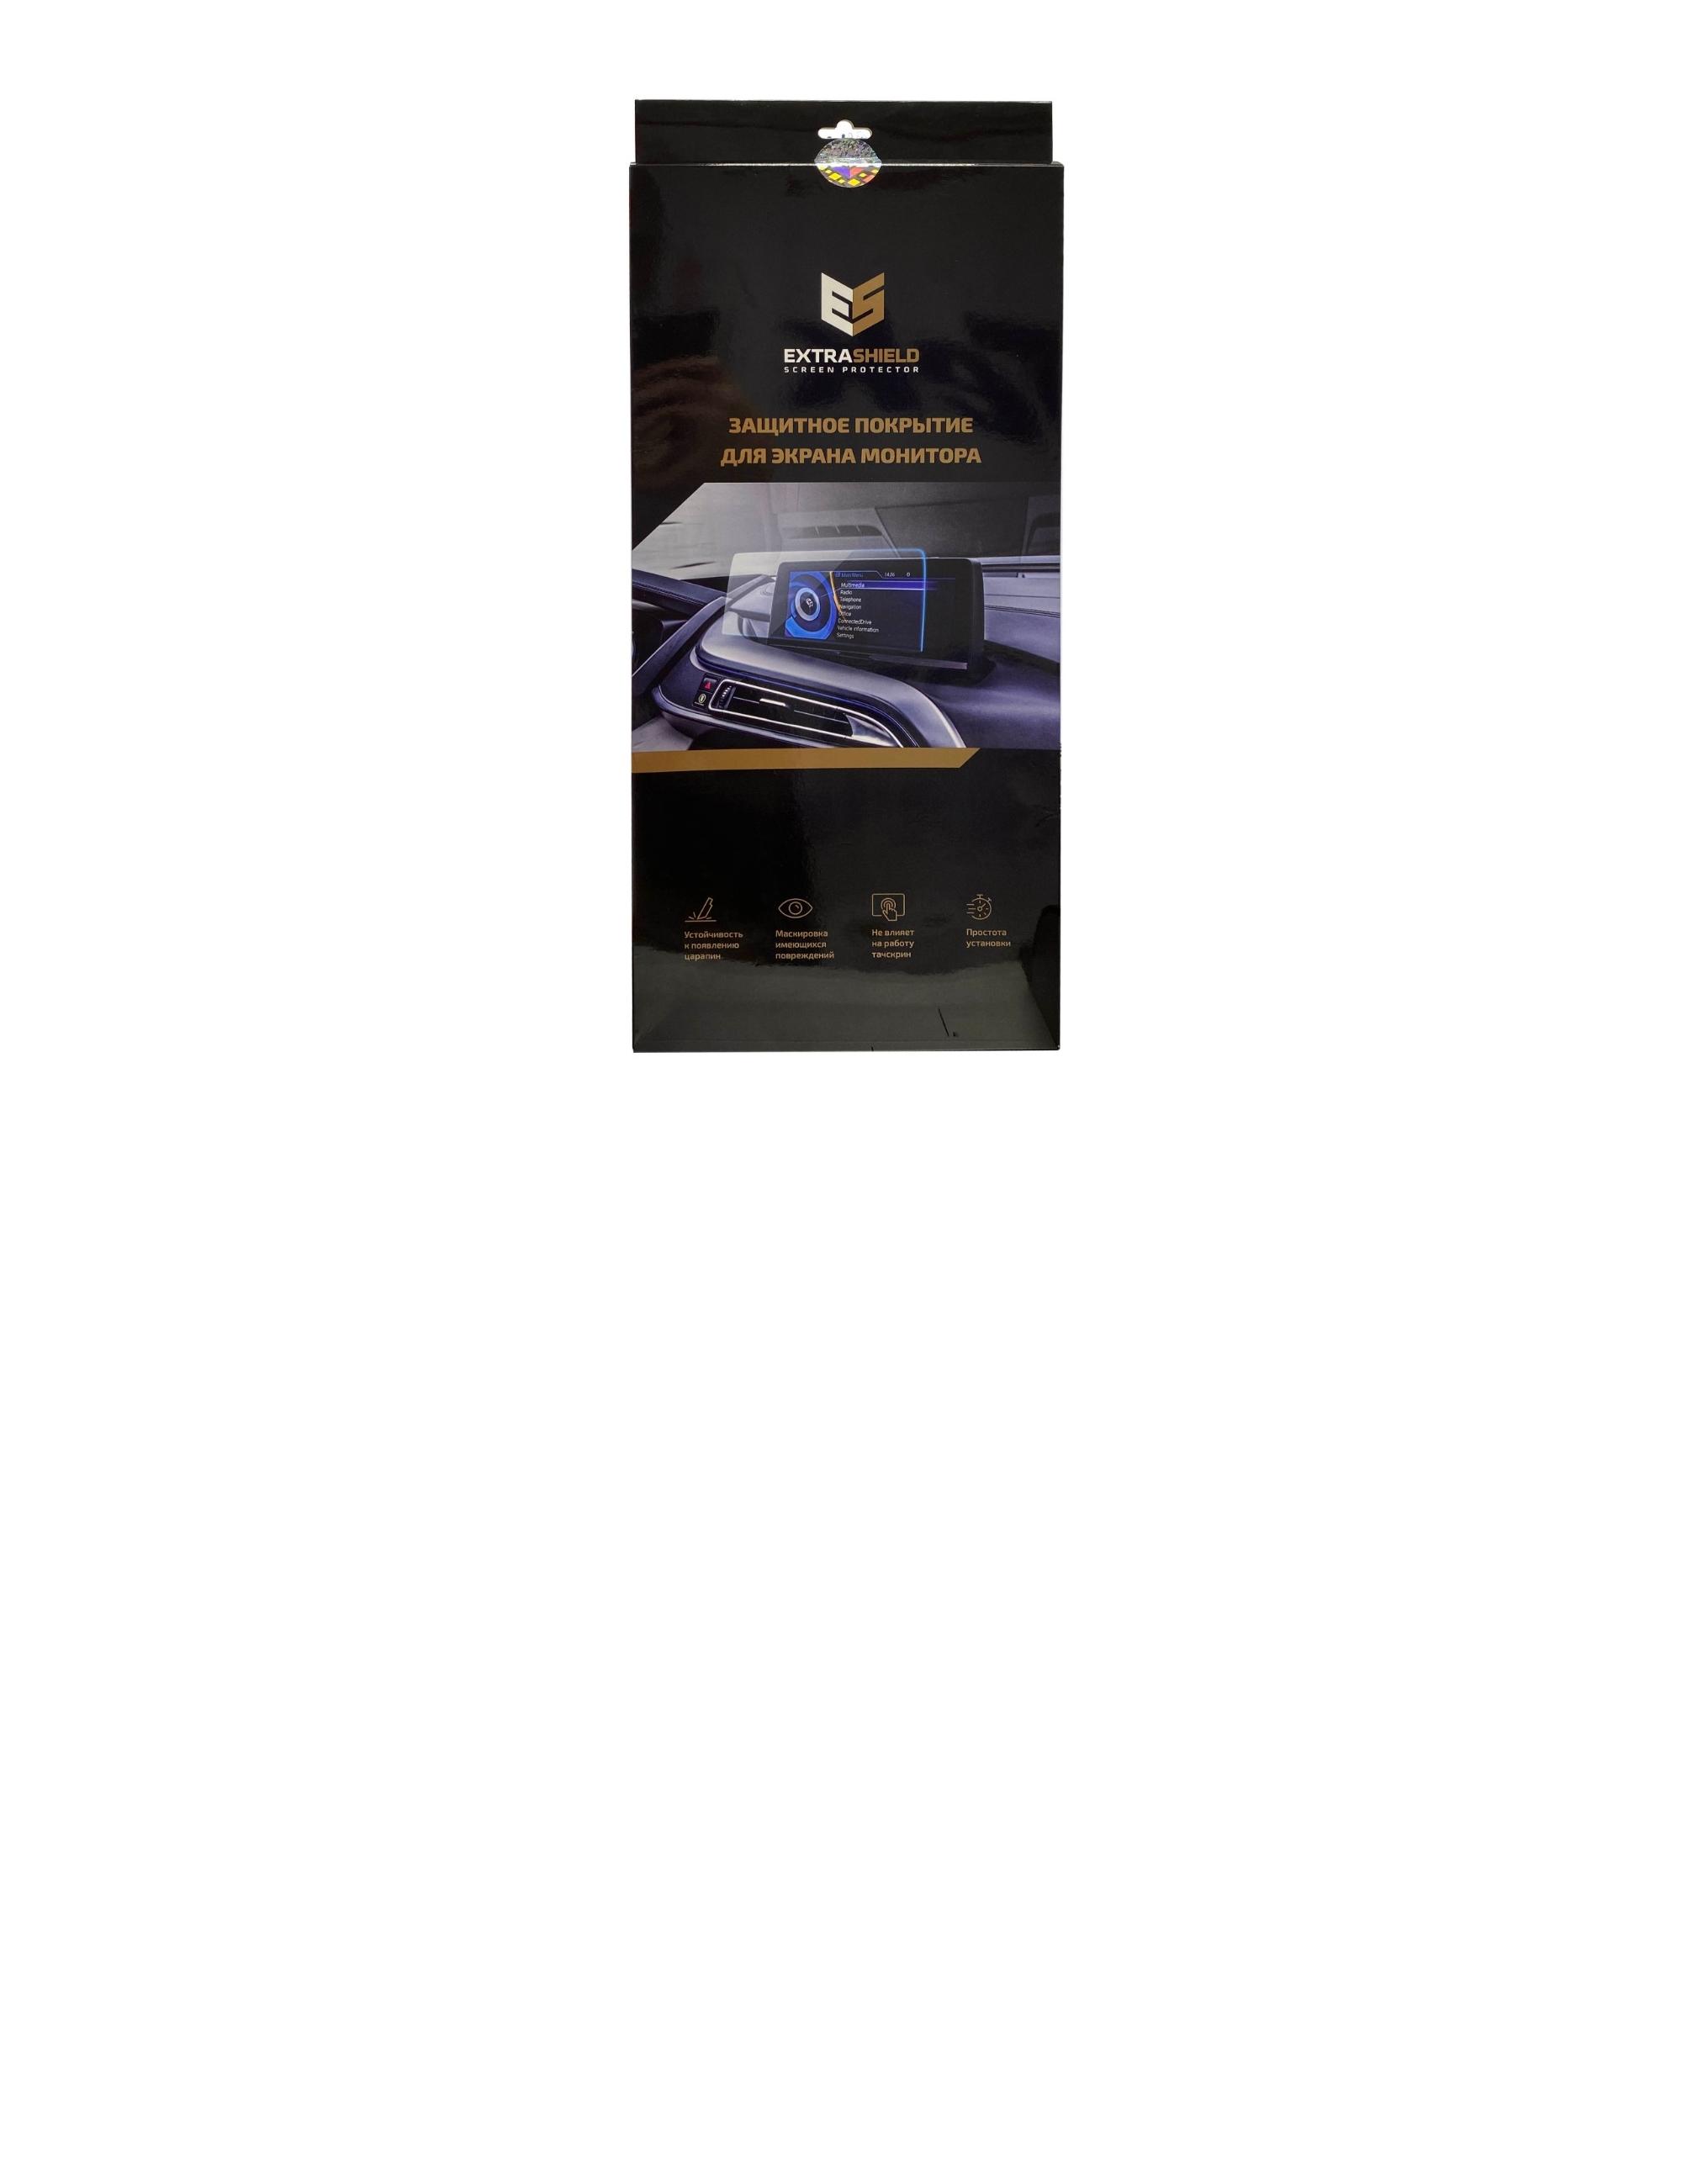 Audi A4 (B9) 2015 - н.в. мультимедиа MMI 7 Статическая пленка Глянец